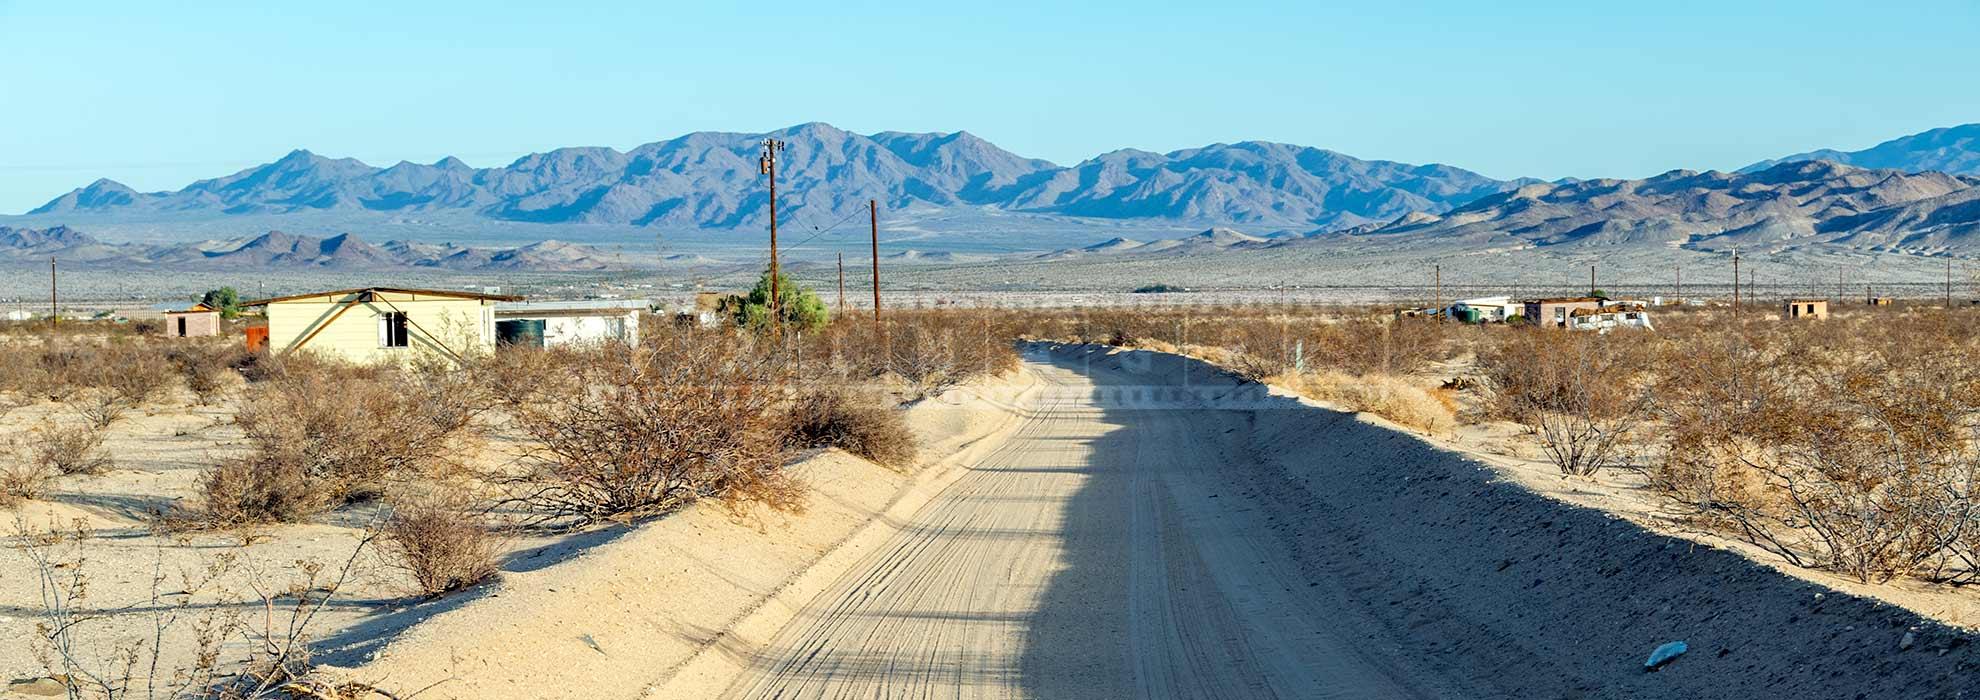 Sand road in the high desert landscape